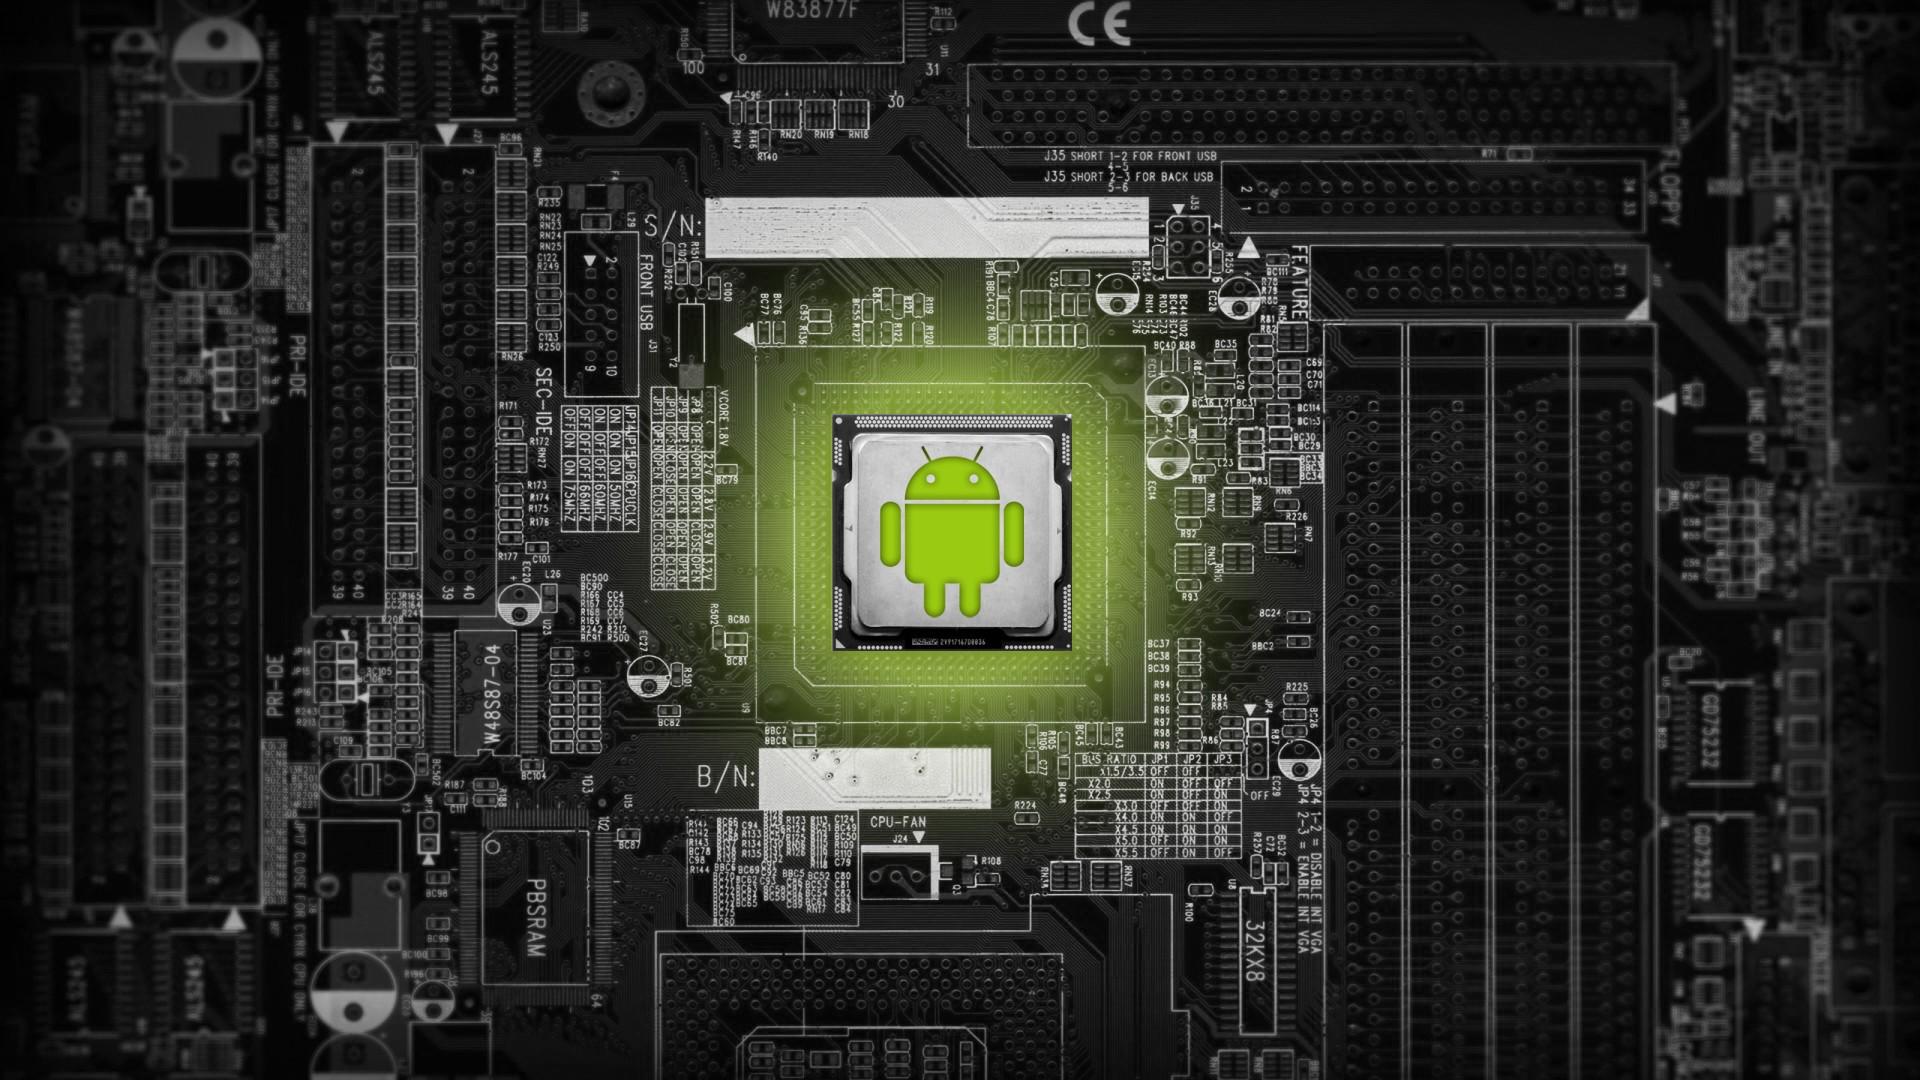 49 ] Android Wallpaper Resize On WallpaperSafari